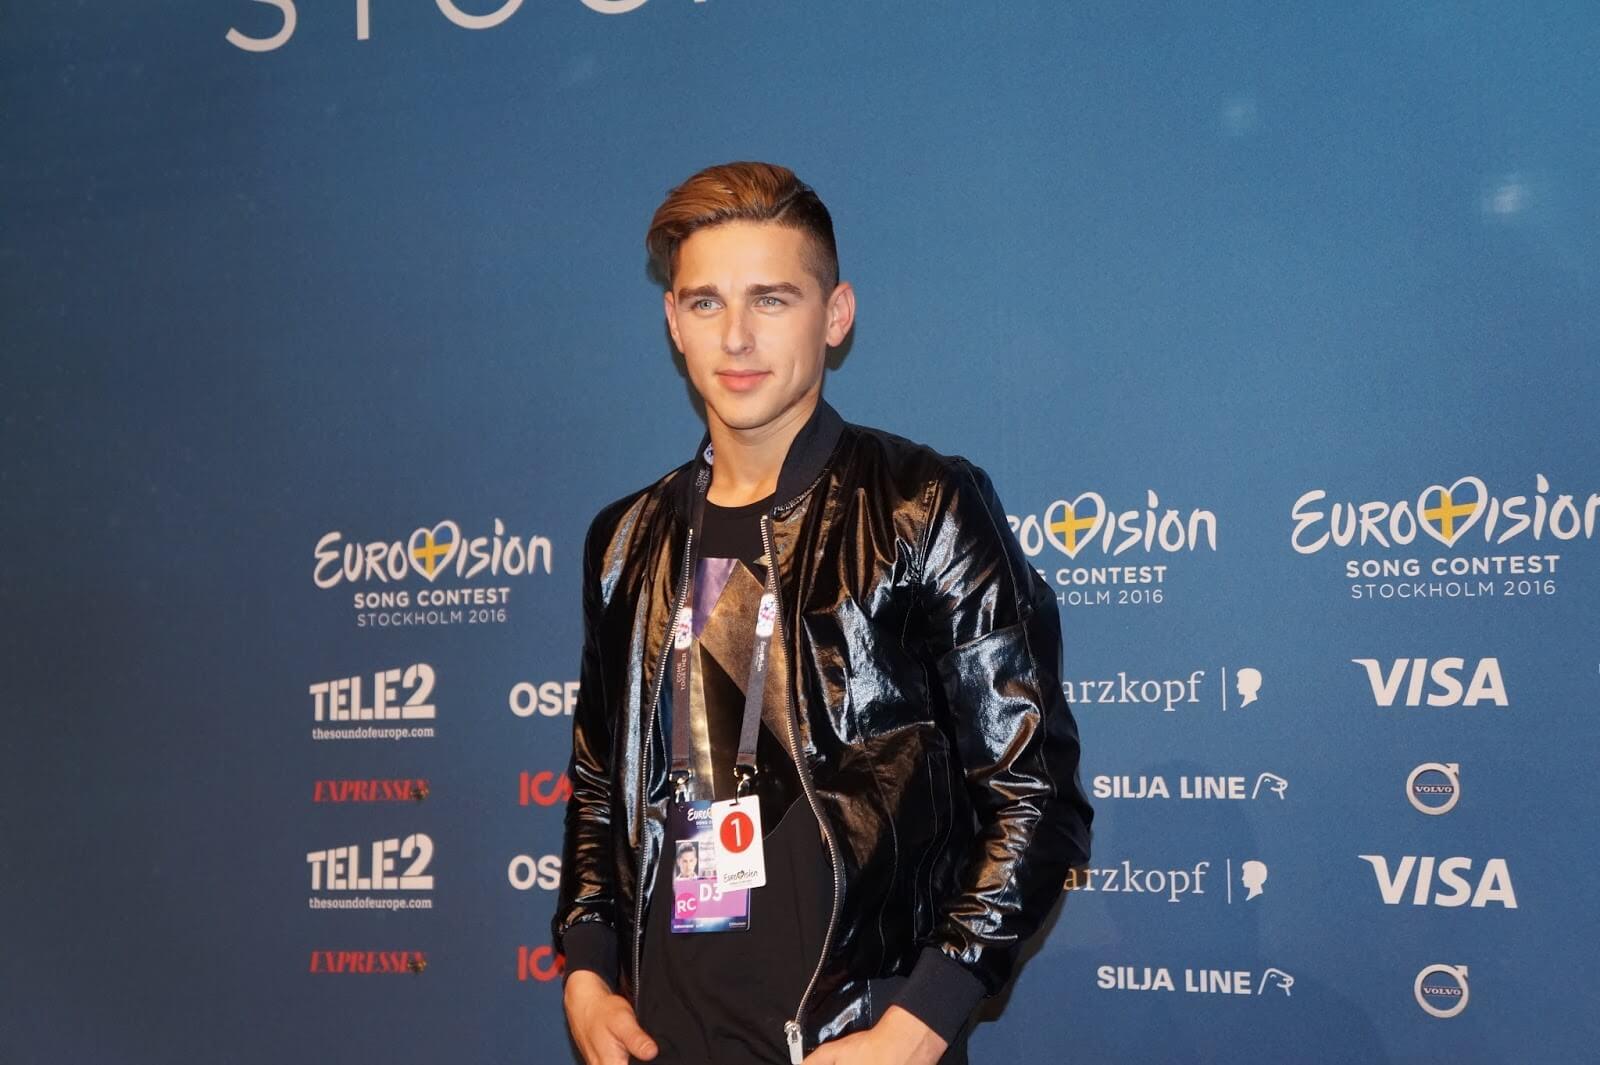 donny_montell_eurovision_2016_lituania